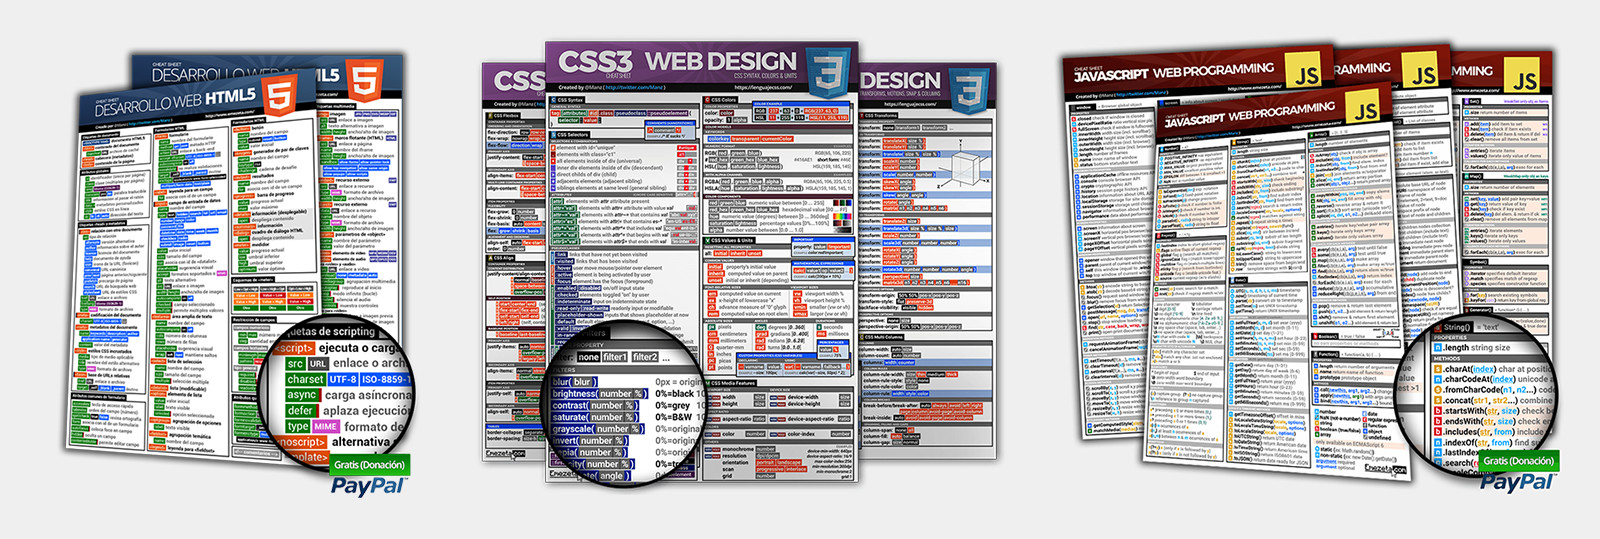 HTML5 CSS3 & Javascript CHEATSHEETS